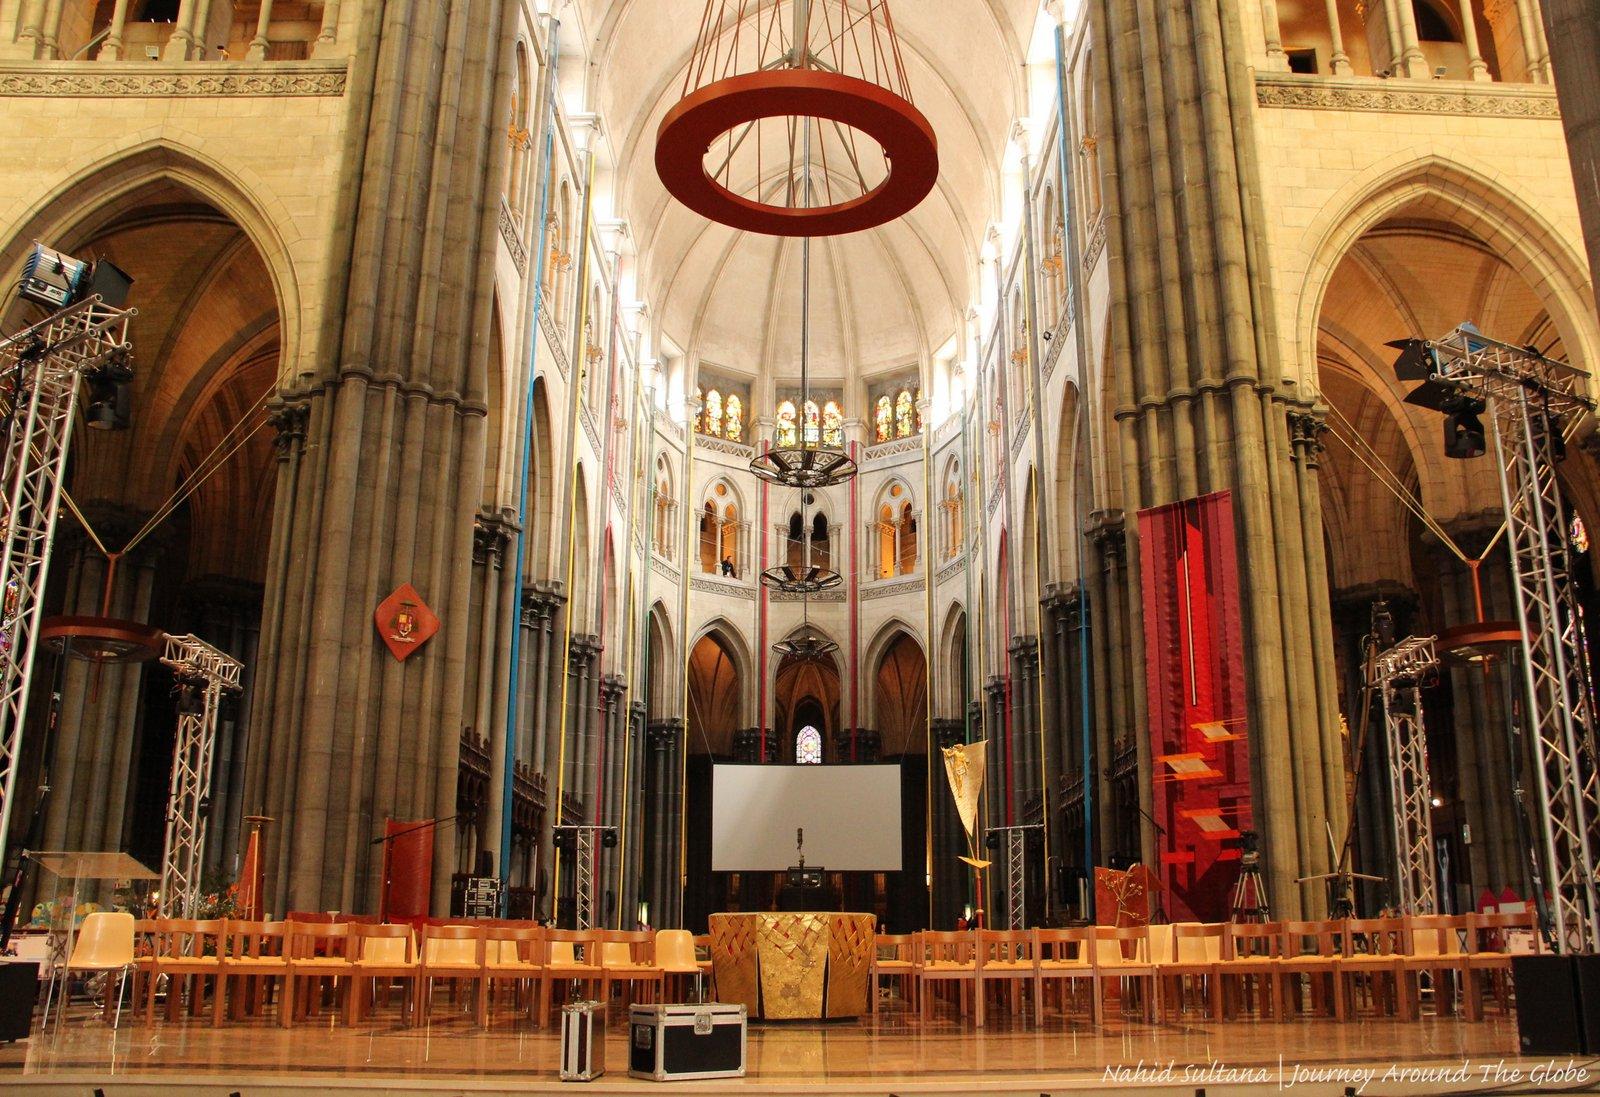 Lille journey around the globe - Eglise notre dame de la treille lille ...